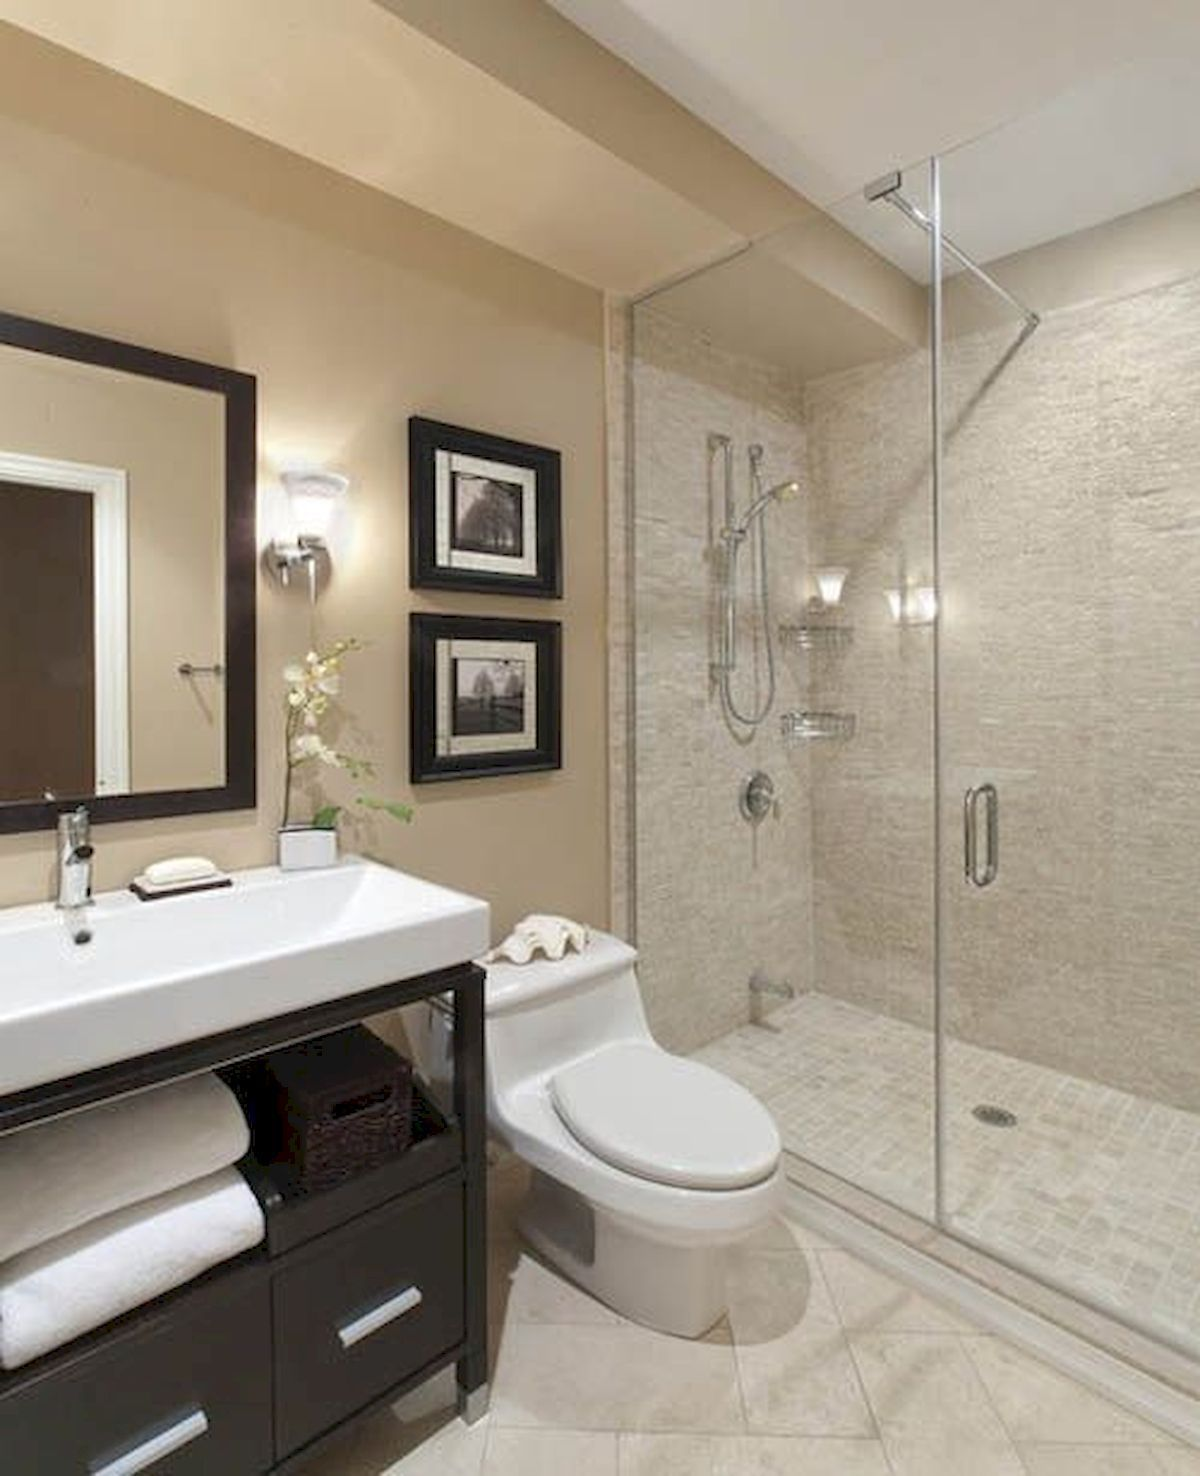 60 Elegant Small Master Bathroom Remodel Ideas 28 Transitional Bathroom Design Bathroom Remodel Master Bathroom Design Small